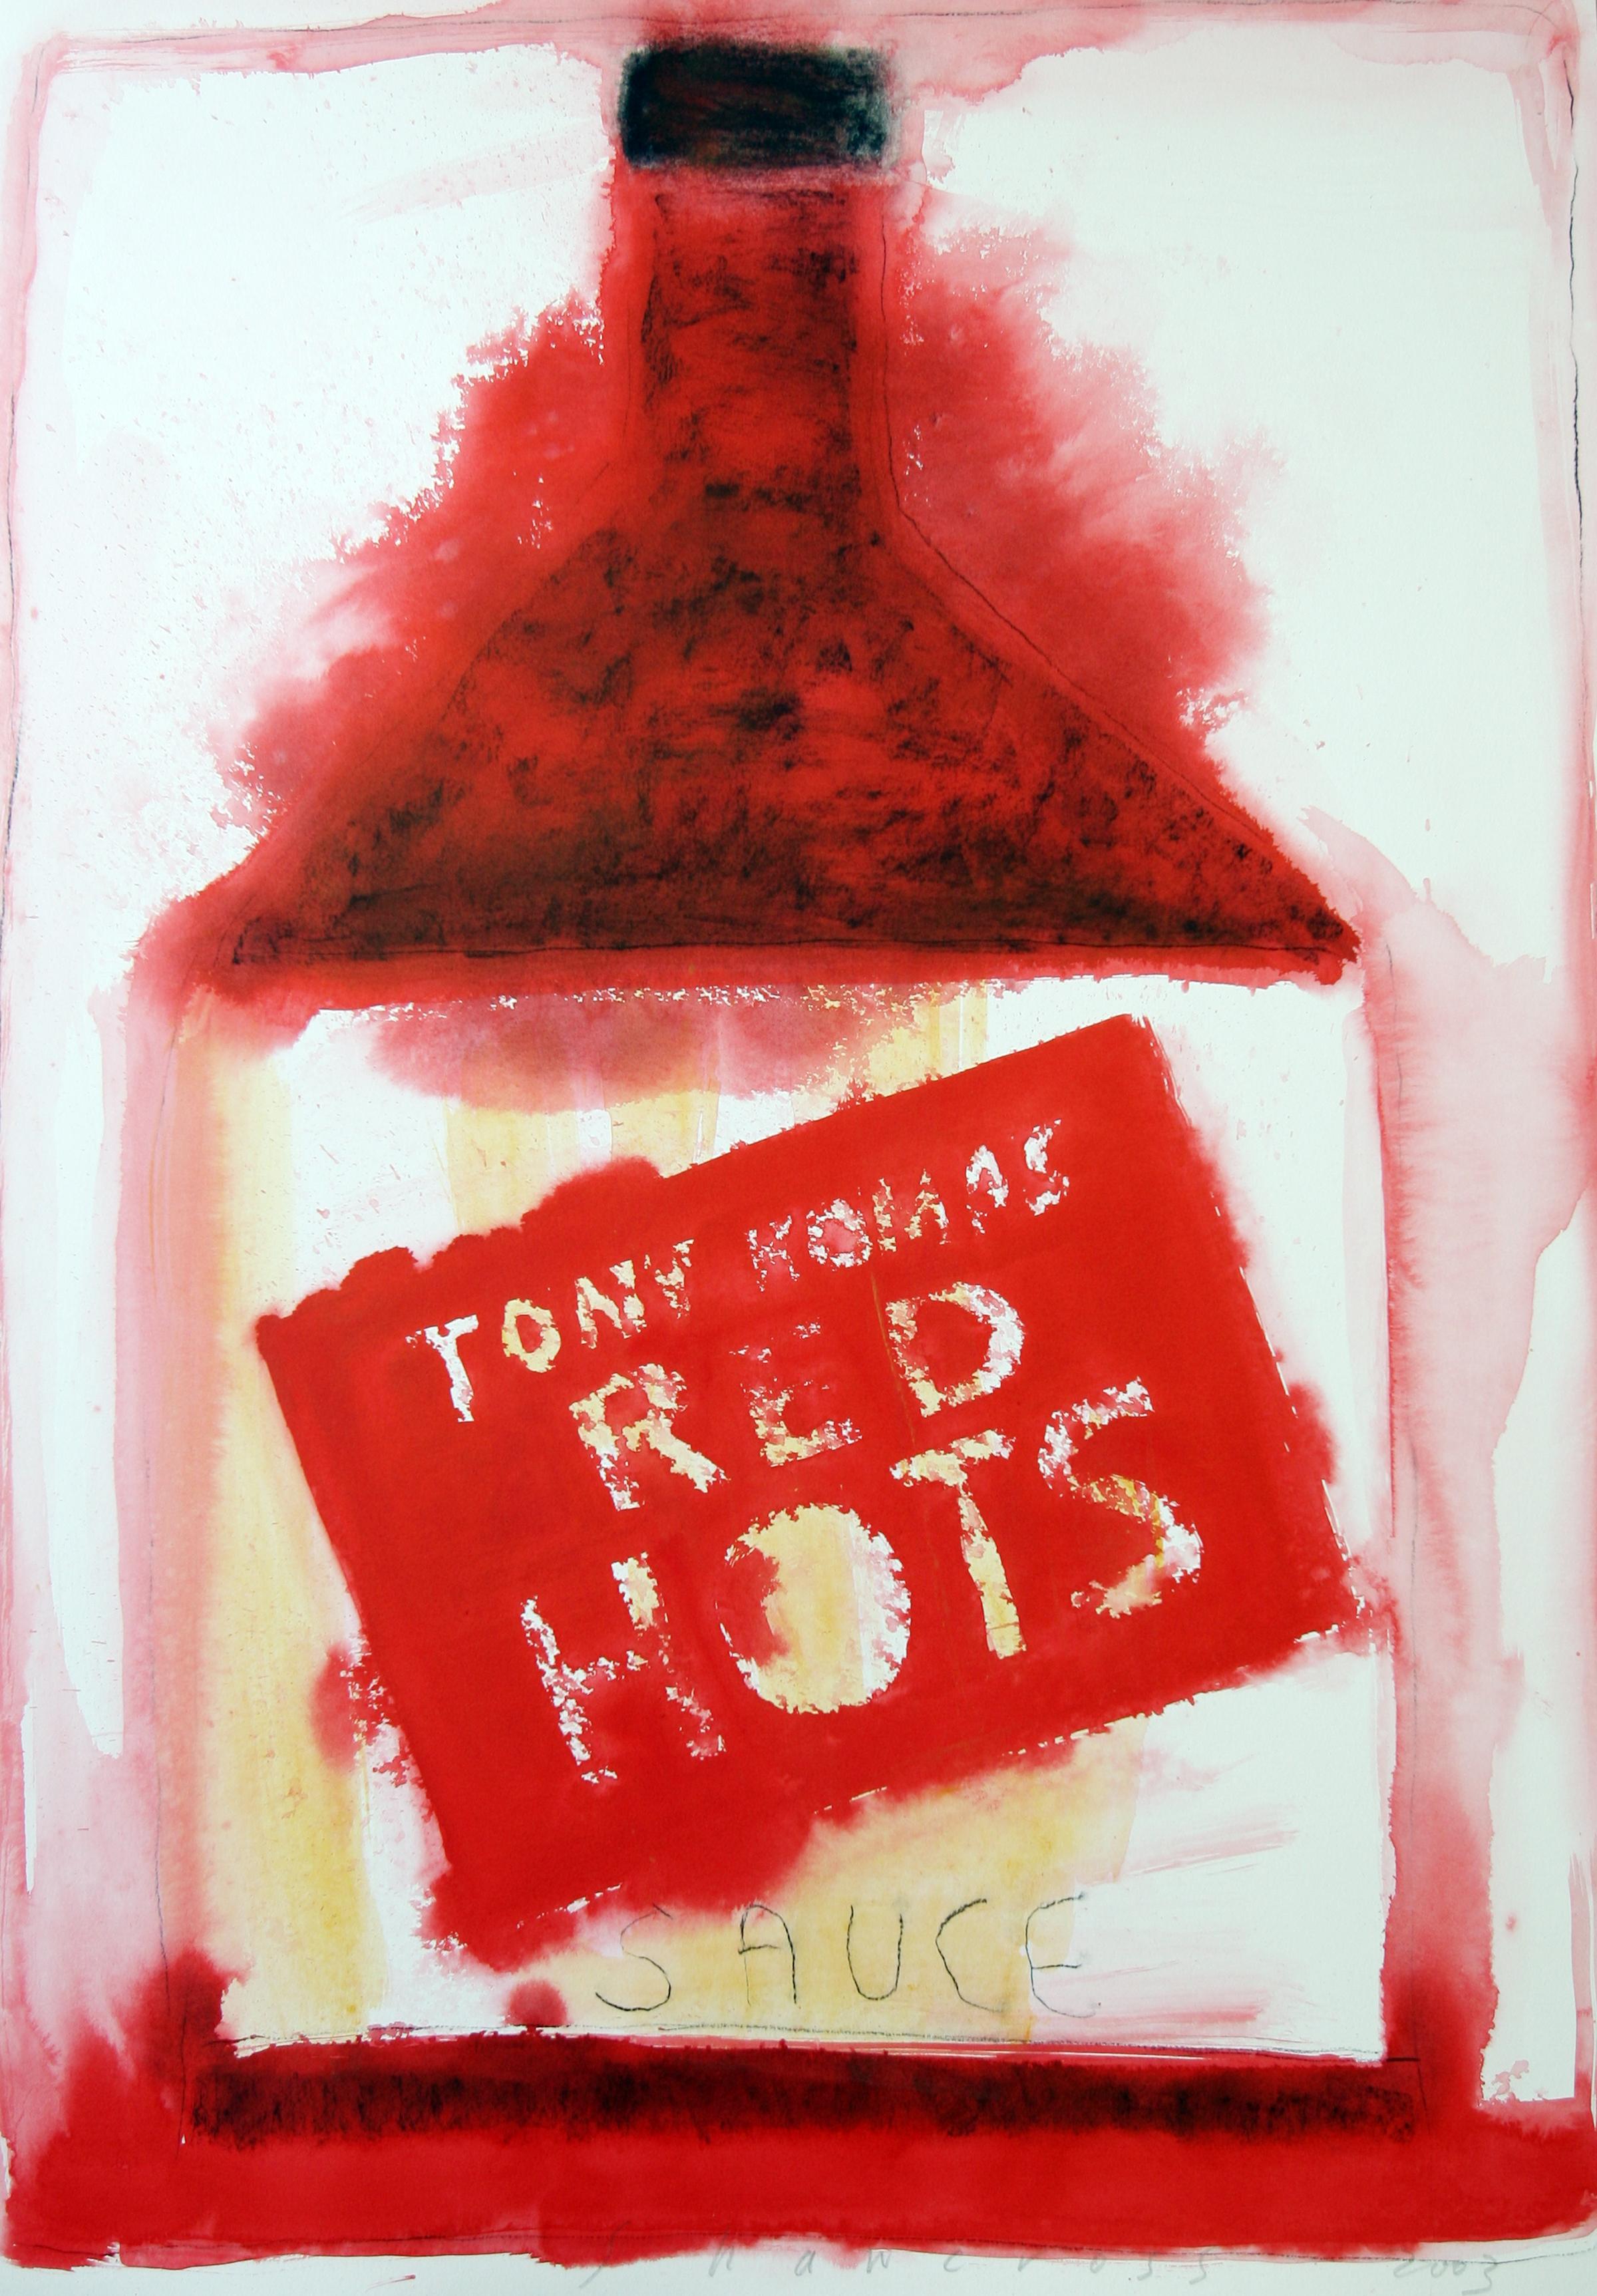 Neil Shawcross_-_Tony Komas Red Hots_acrylic on paper_102 x 76cm.jpg